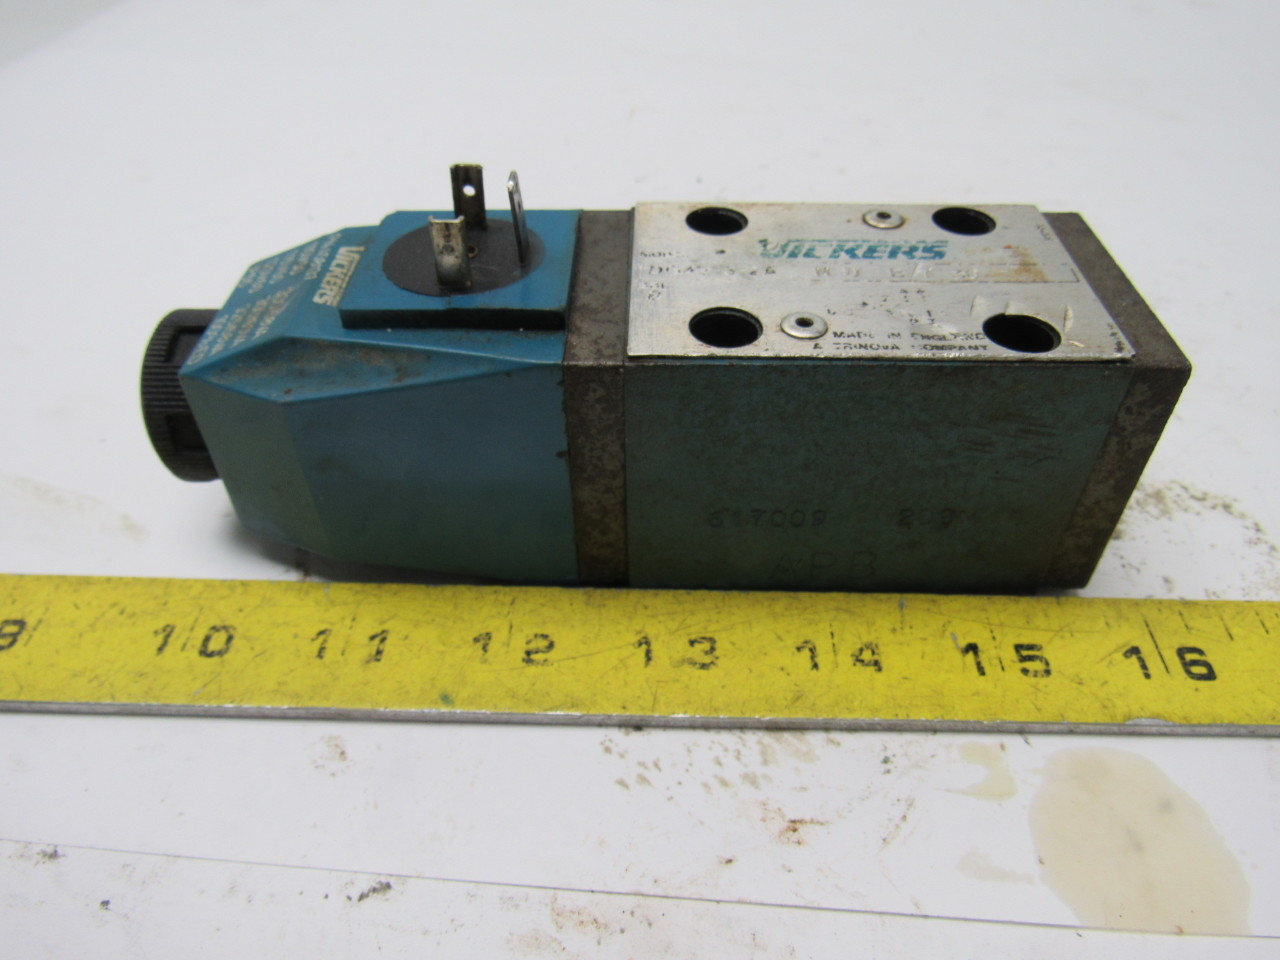 Vickers DG4V-3-2A-M-U-B7-30 Hydraulic Control Valve 120V Coil